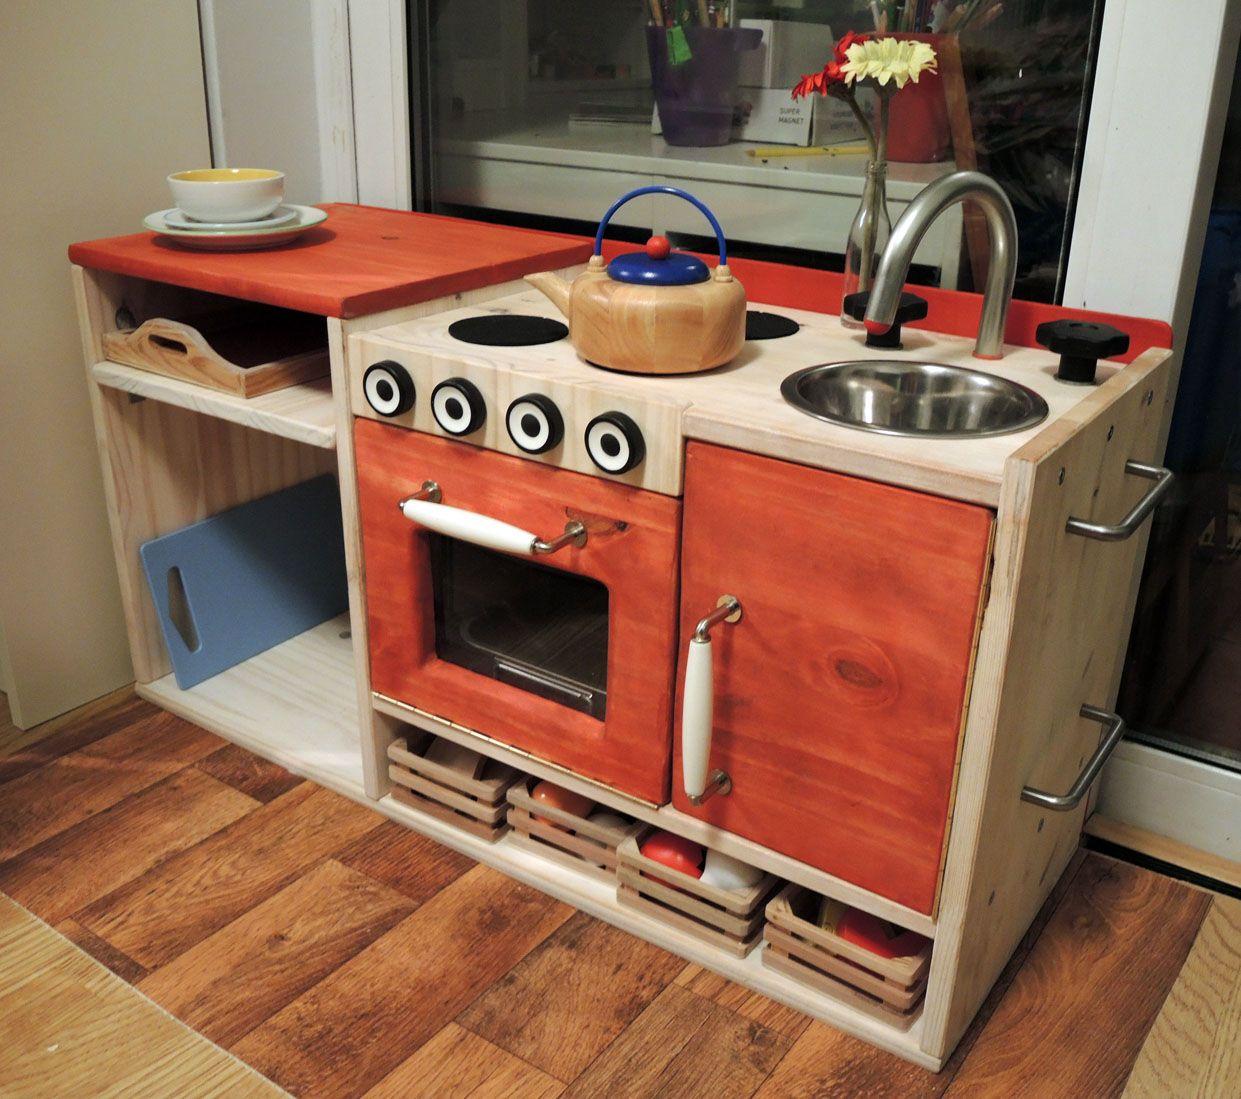 Ikea Kitchen Diy: Ikea Rast DIY Play Kitchen Hack